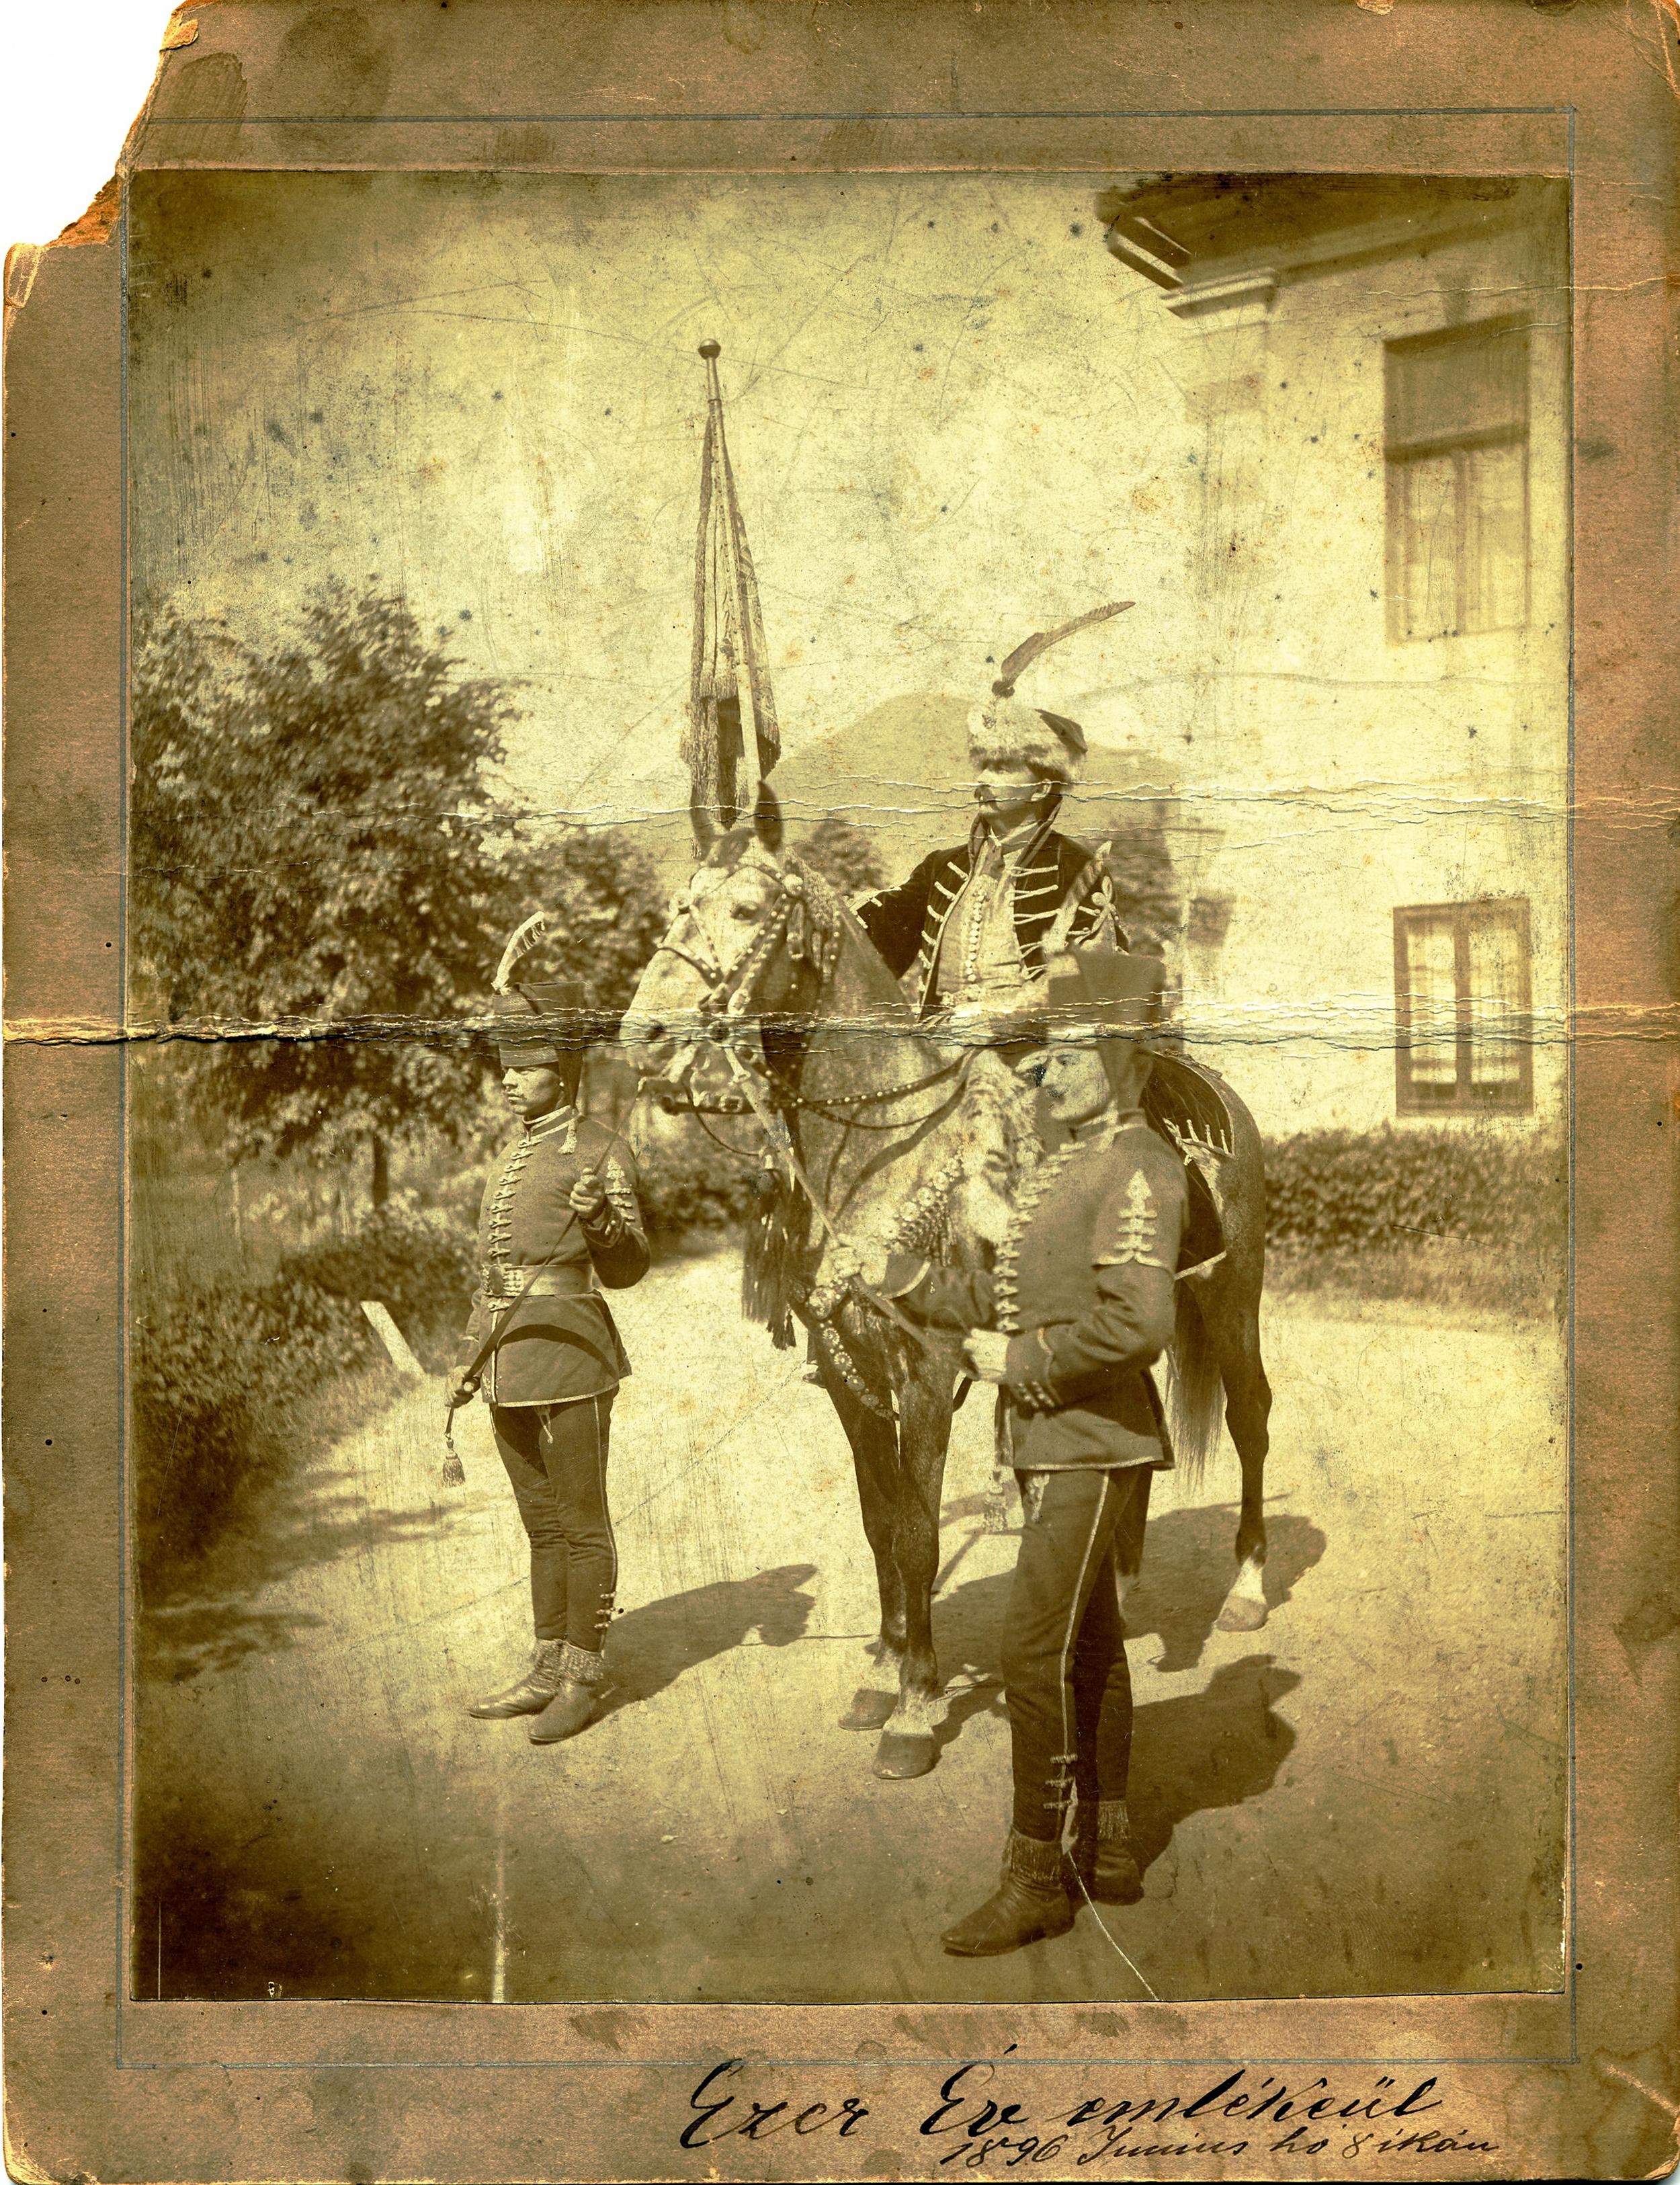 JU's grandfather (right foreground) Honor Guard - Royal Palace - Budapest, Hungary, 1898